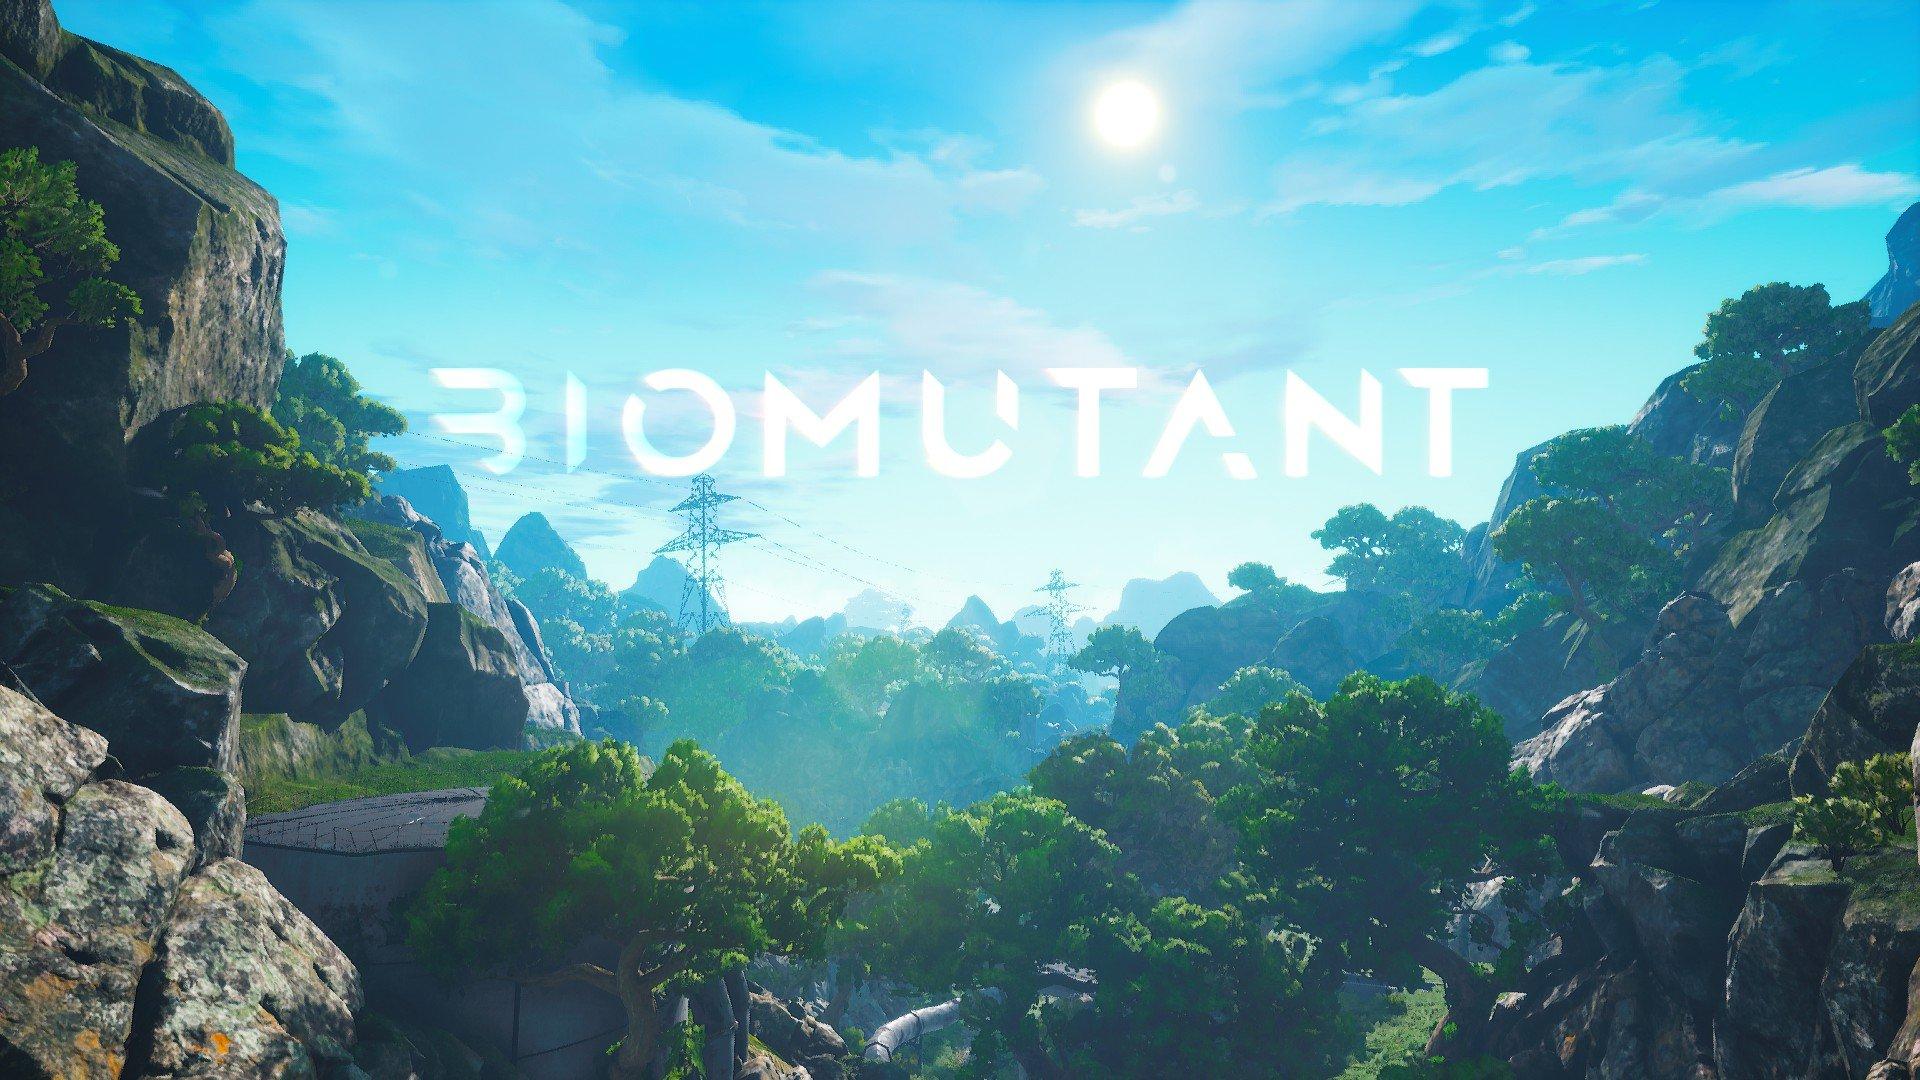 Biomutant - All Endings Guide